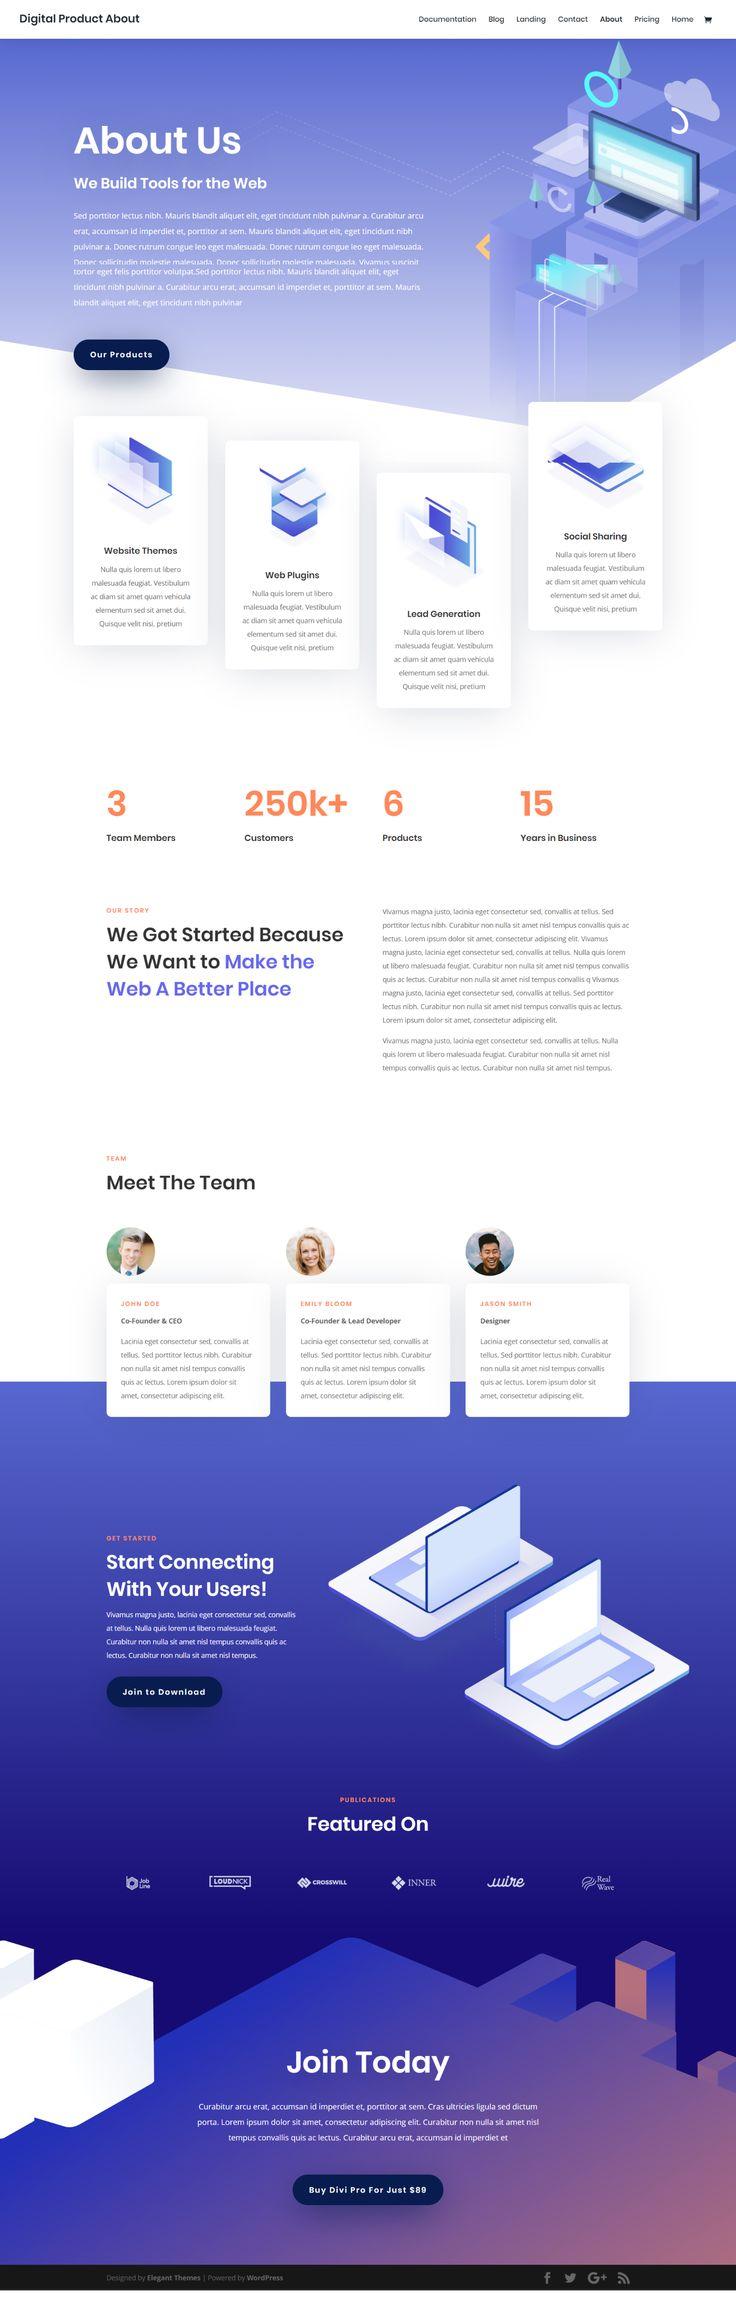 Free Modern Isometric Startup Website WordPress Template | WP Theme Web Design Inspiration Idea